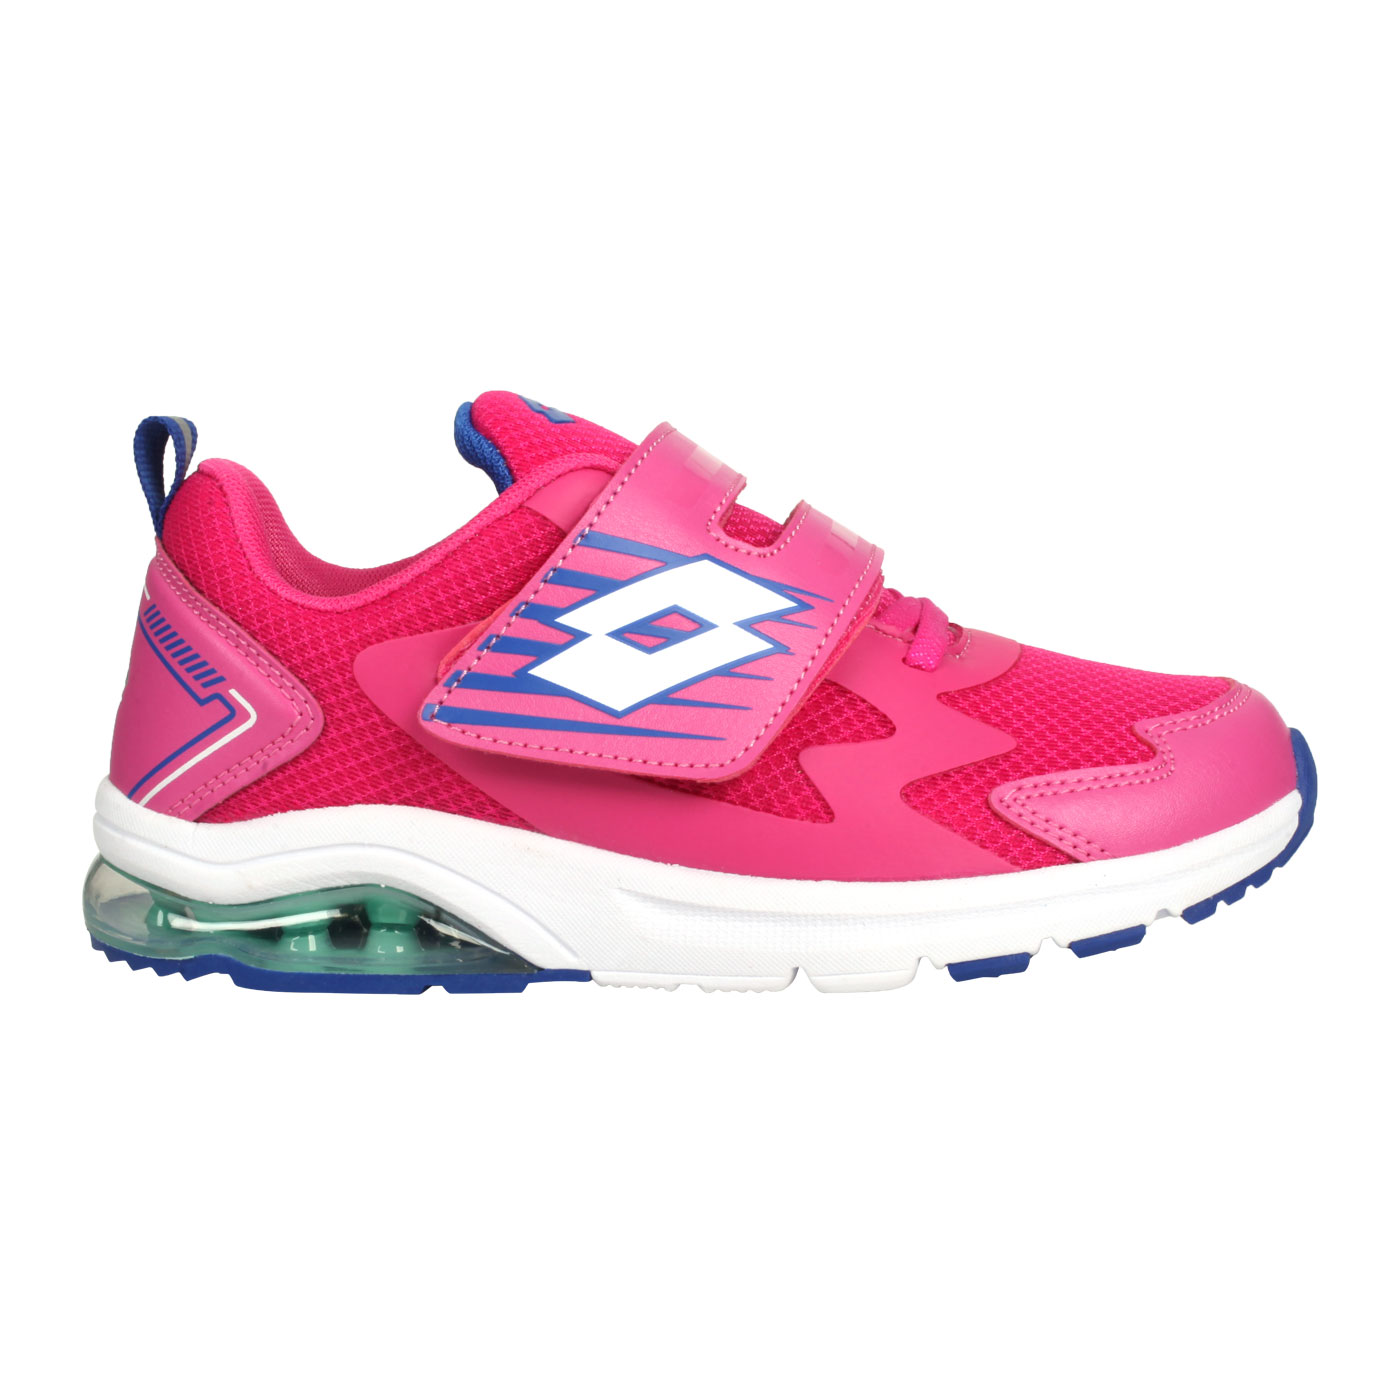 LOTTO FUN RIDE大童輕量氣墊運動鞋 LT0AKR2693 - 桃紅藍